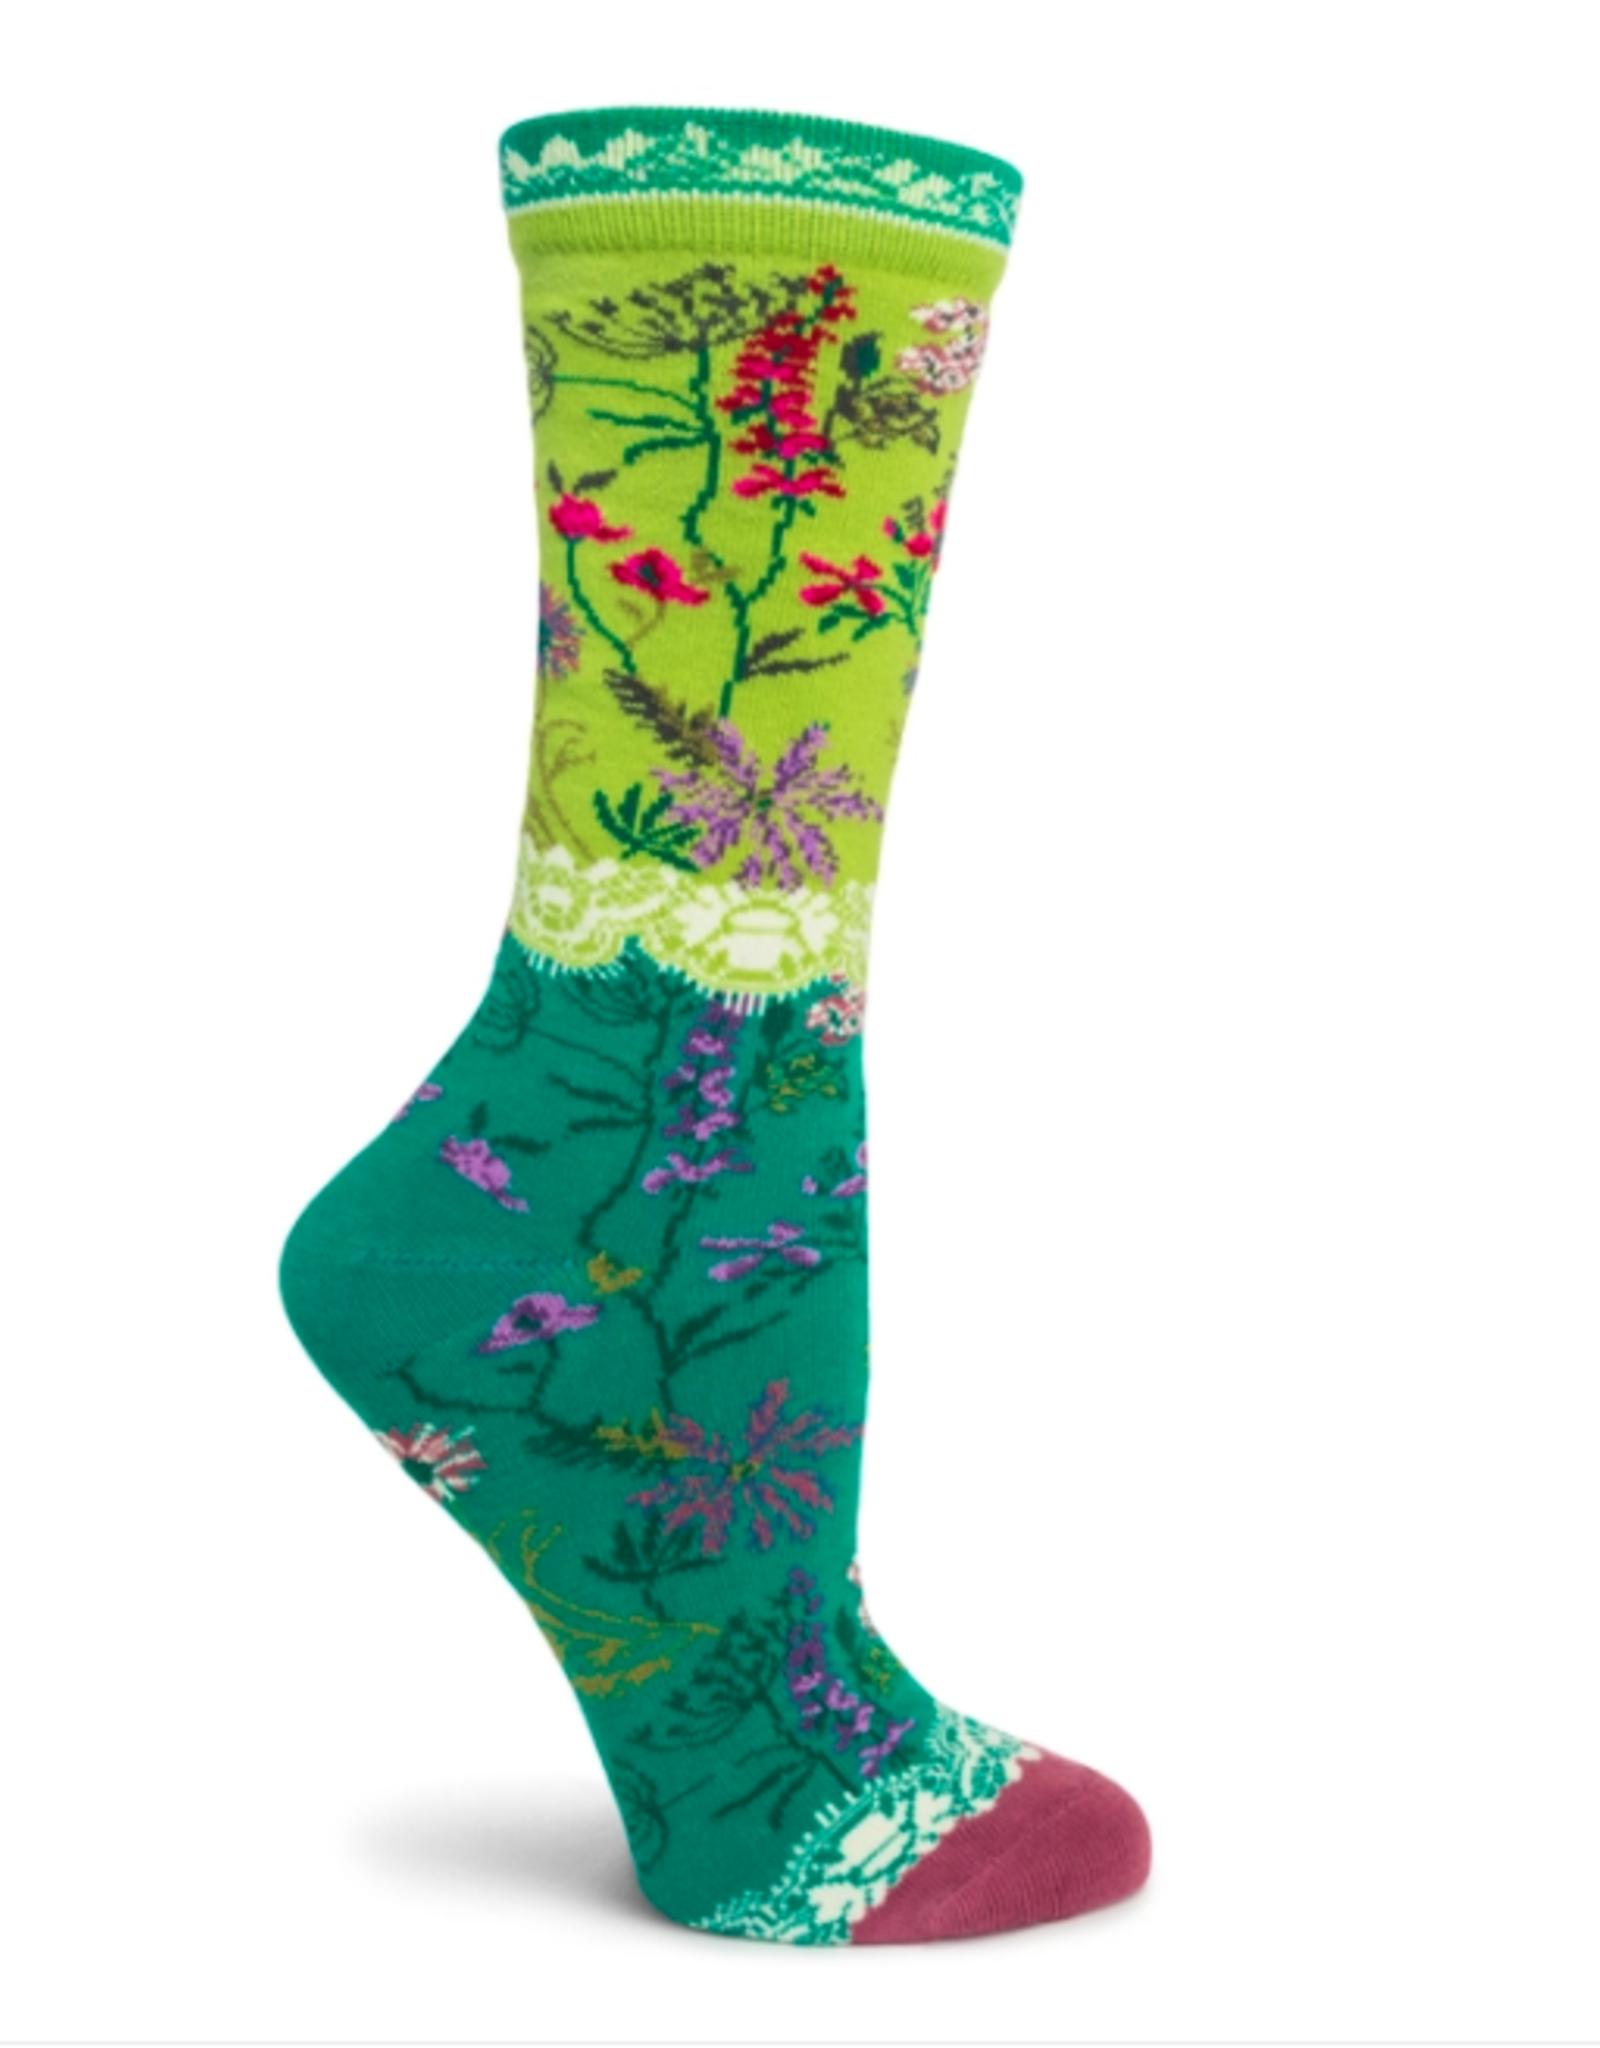 Ozone Designs Garden Lace Socks